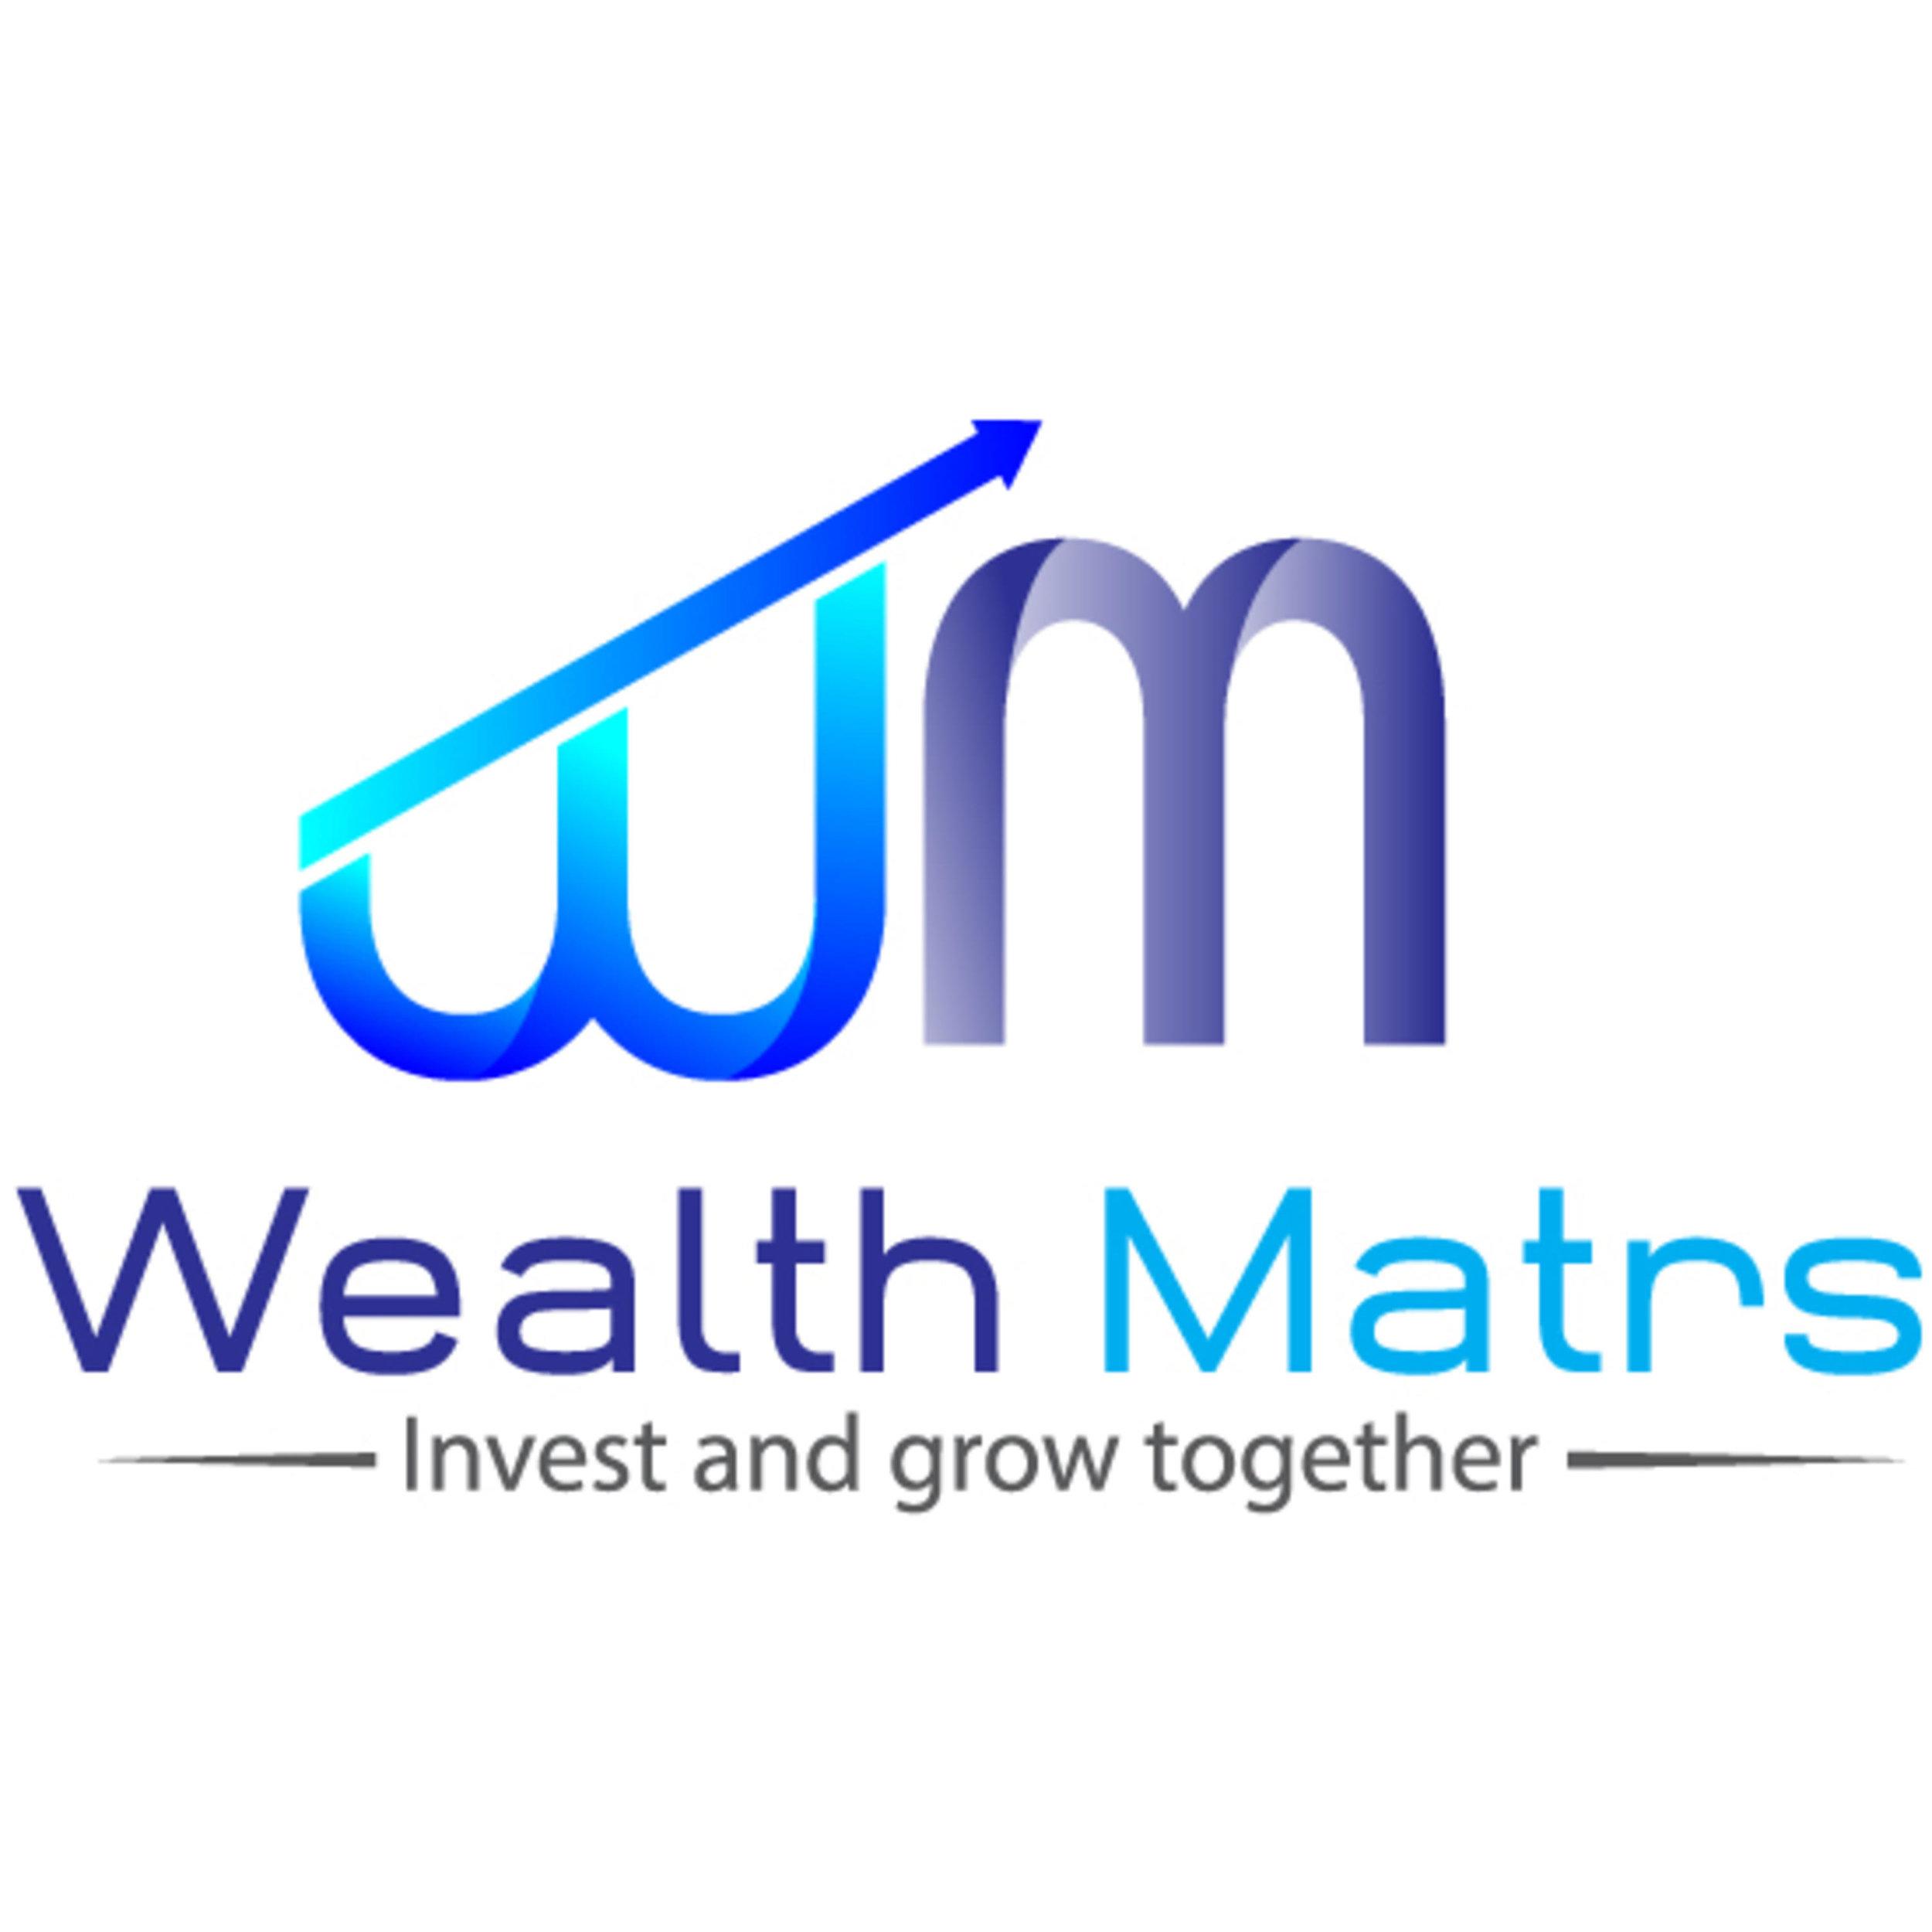 Wealth Matters - Alpesh Parmar